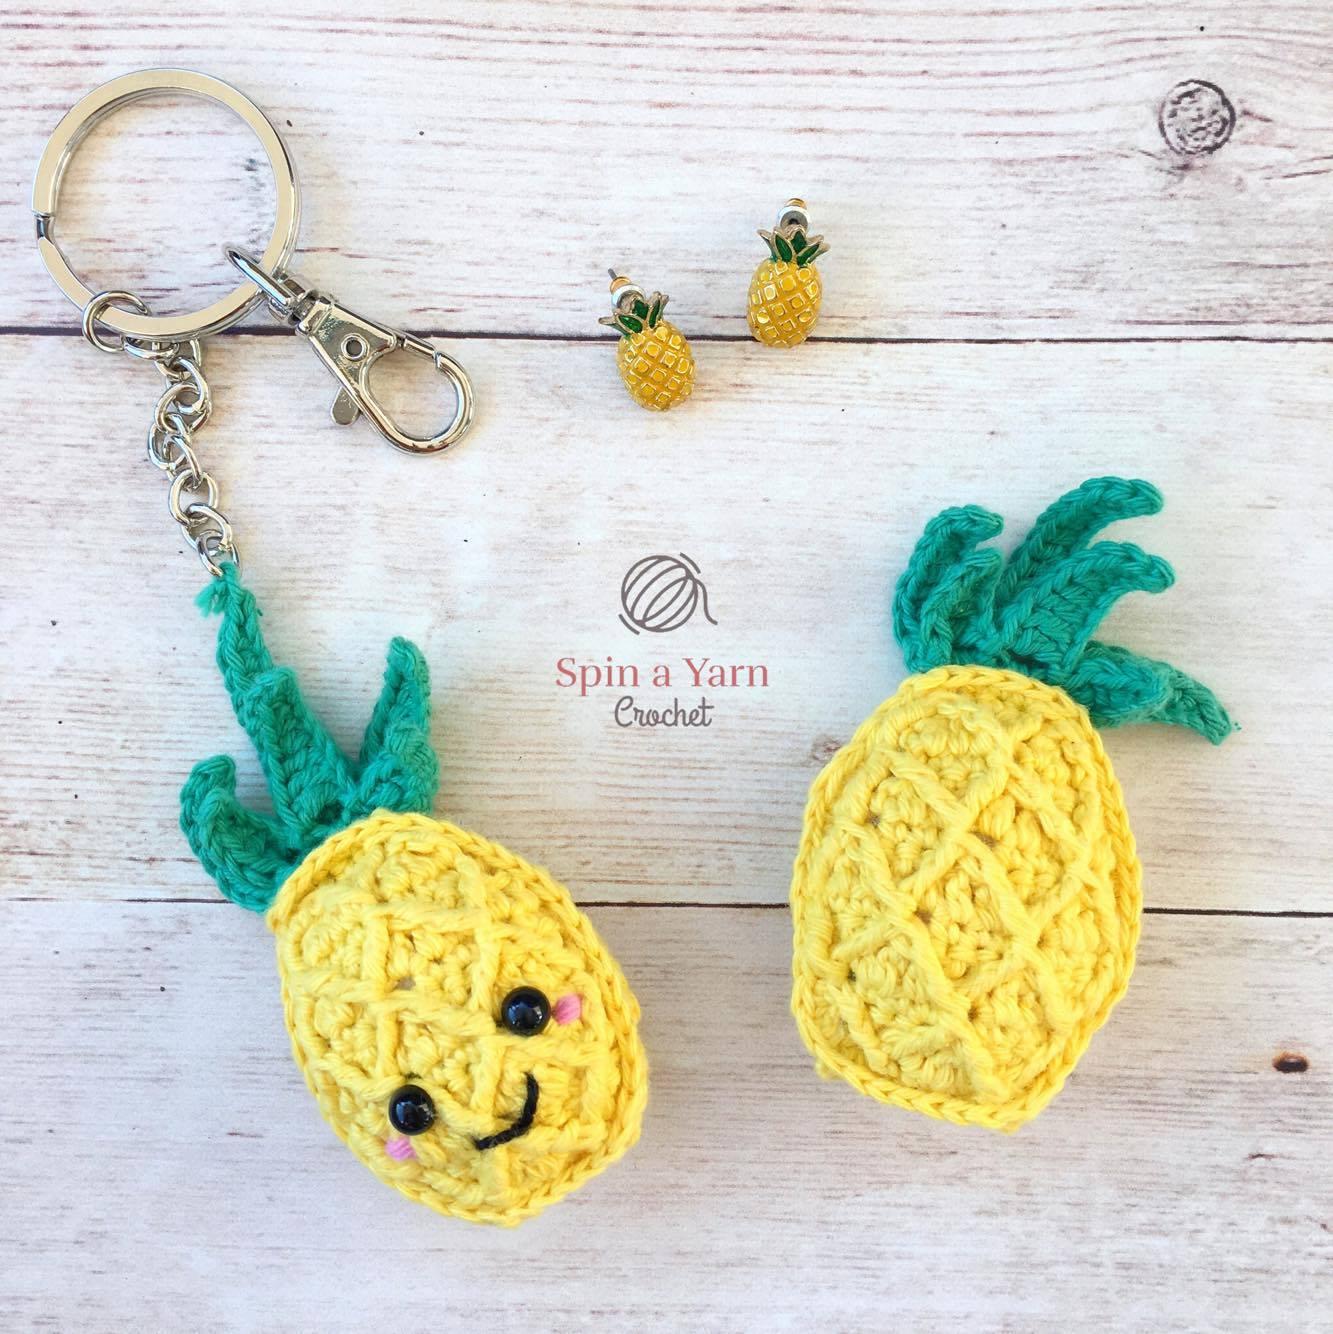 Crochet Amigurumi Keychain Free Pattern : Pineapple keychain free crochet pattern u spin a yarn crochet